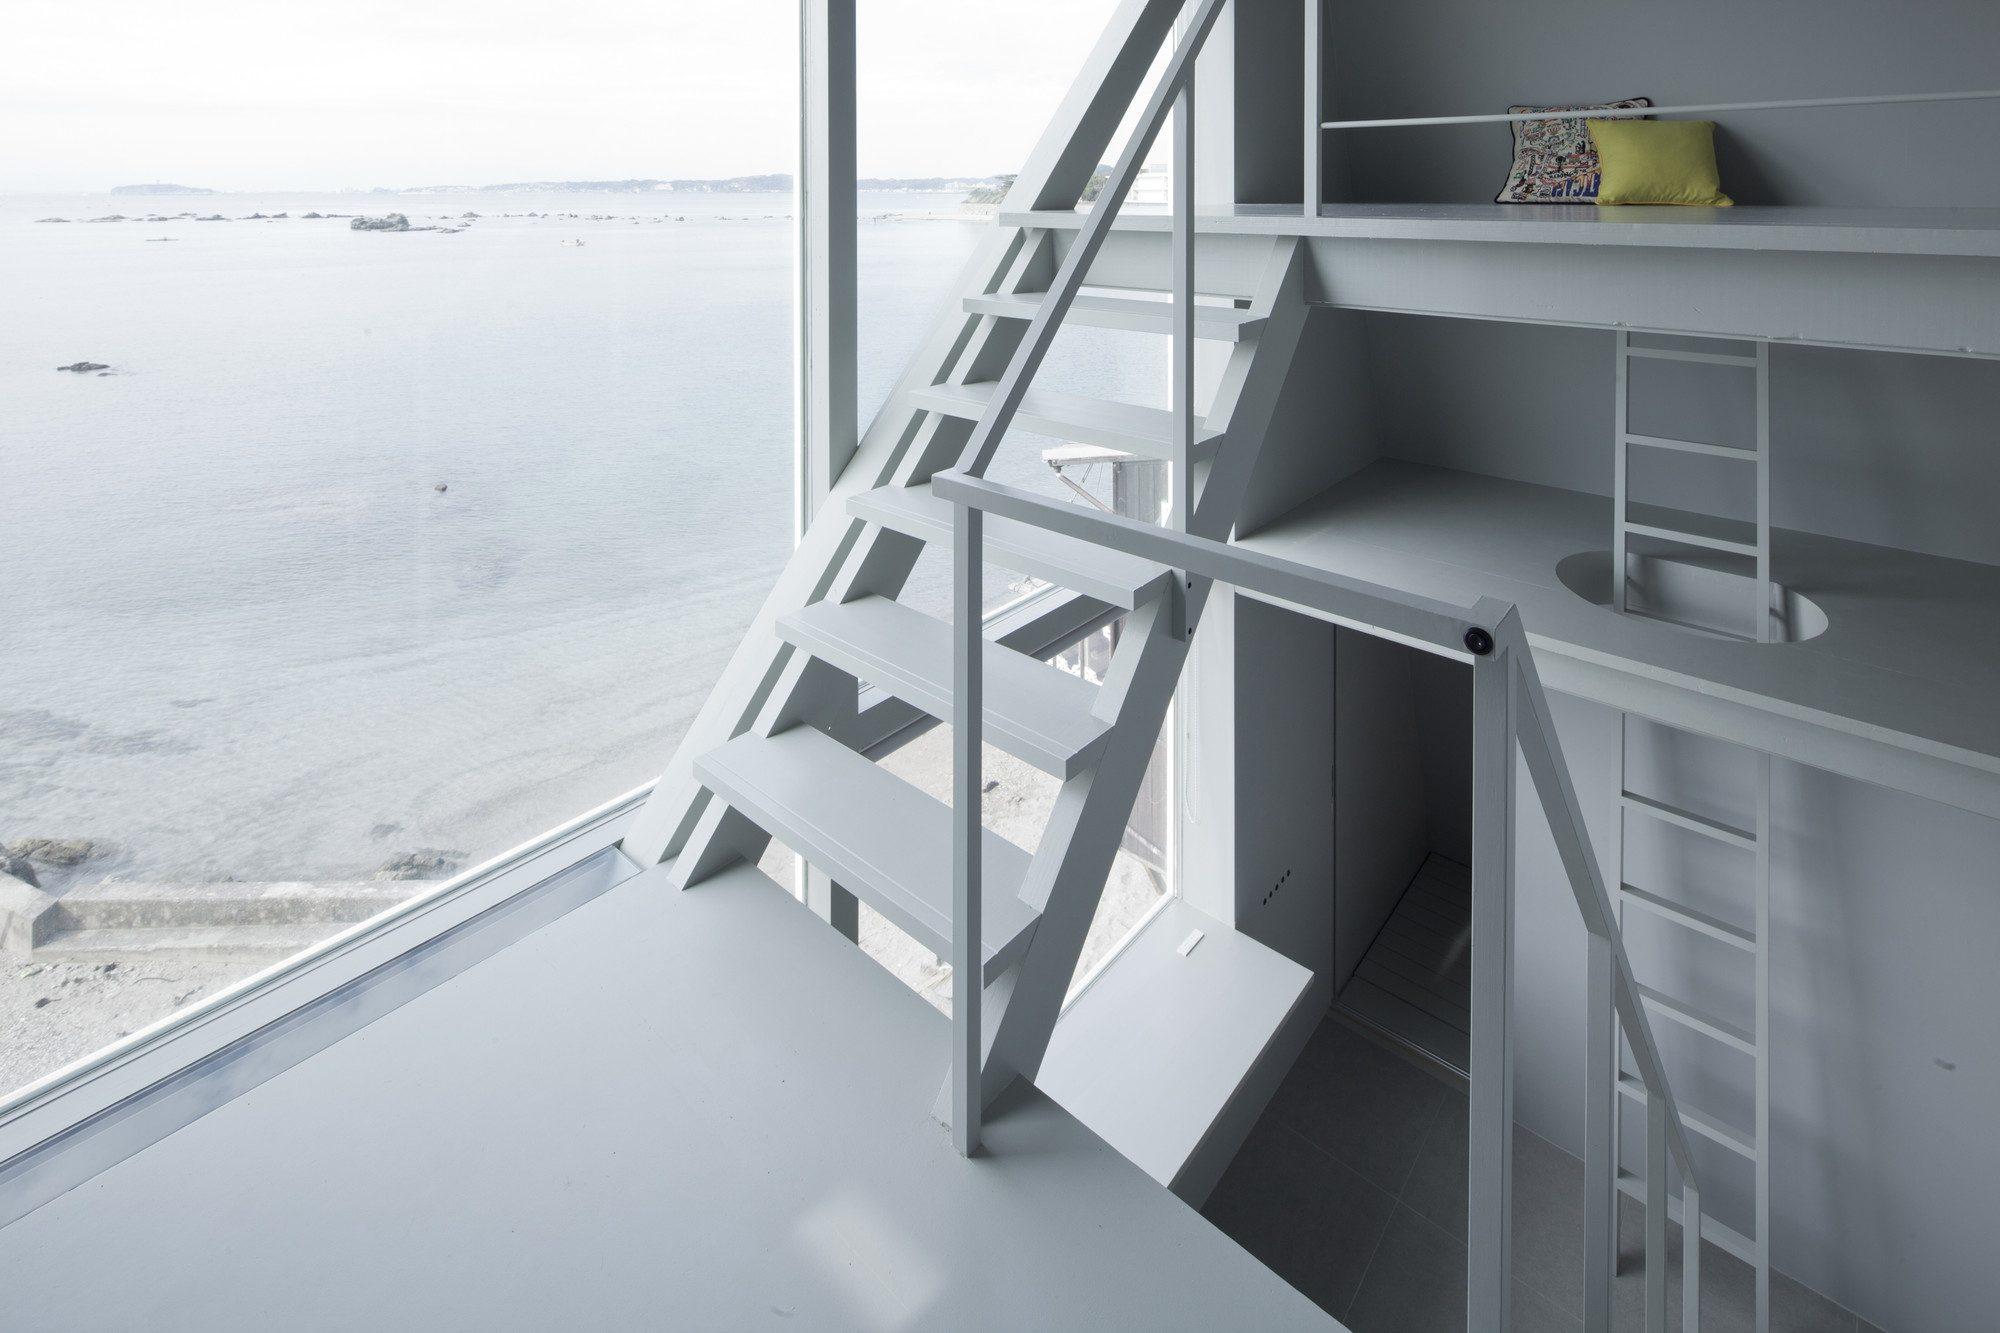 10 – Window House, Kanagawa, Japão